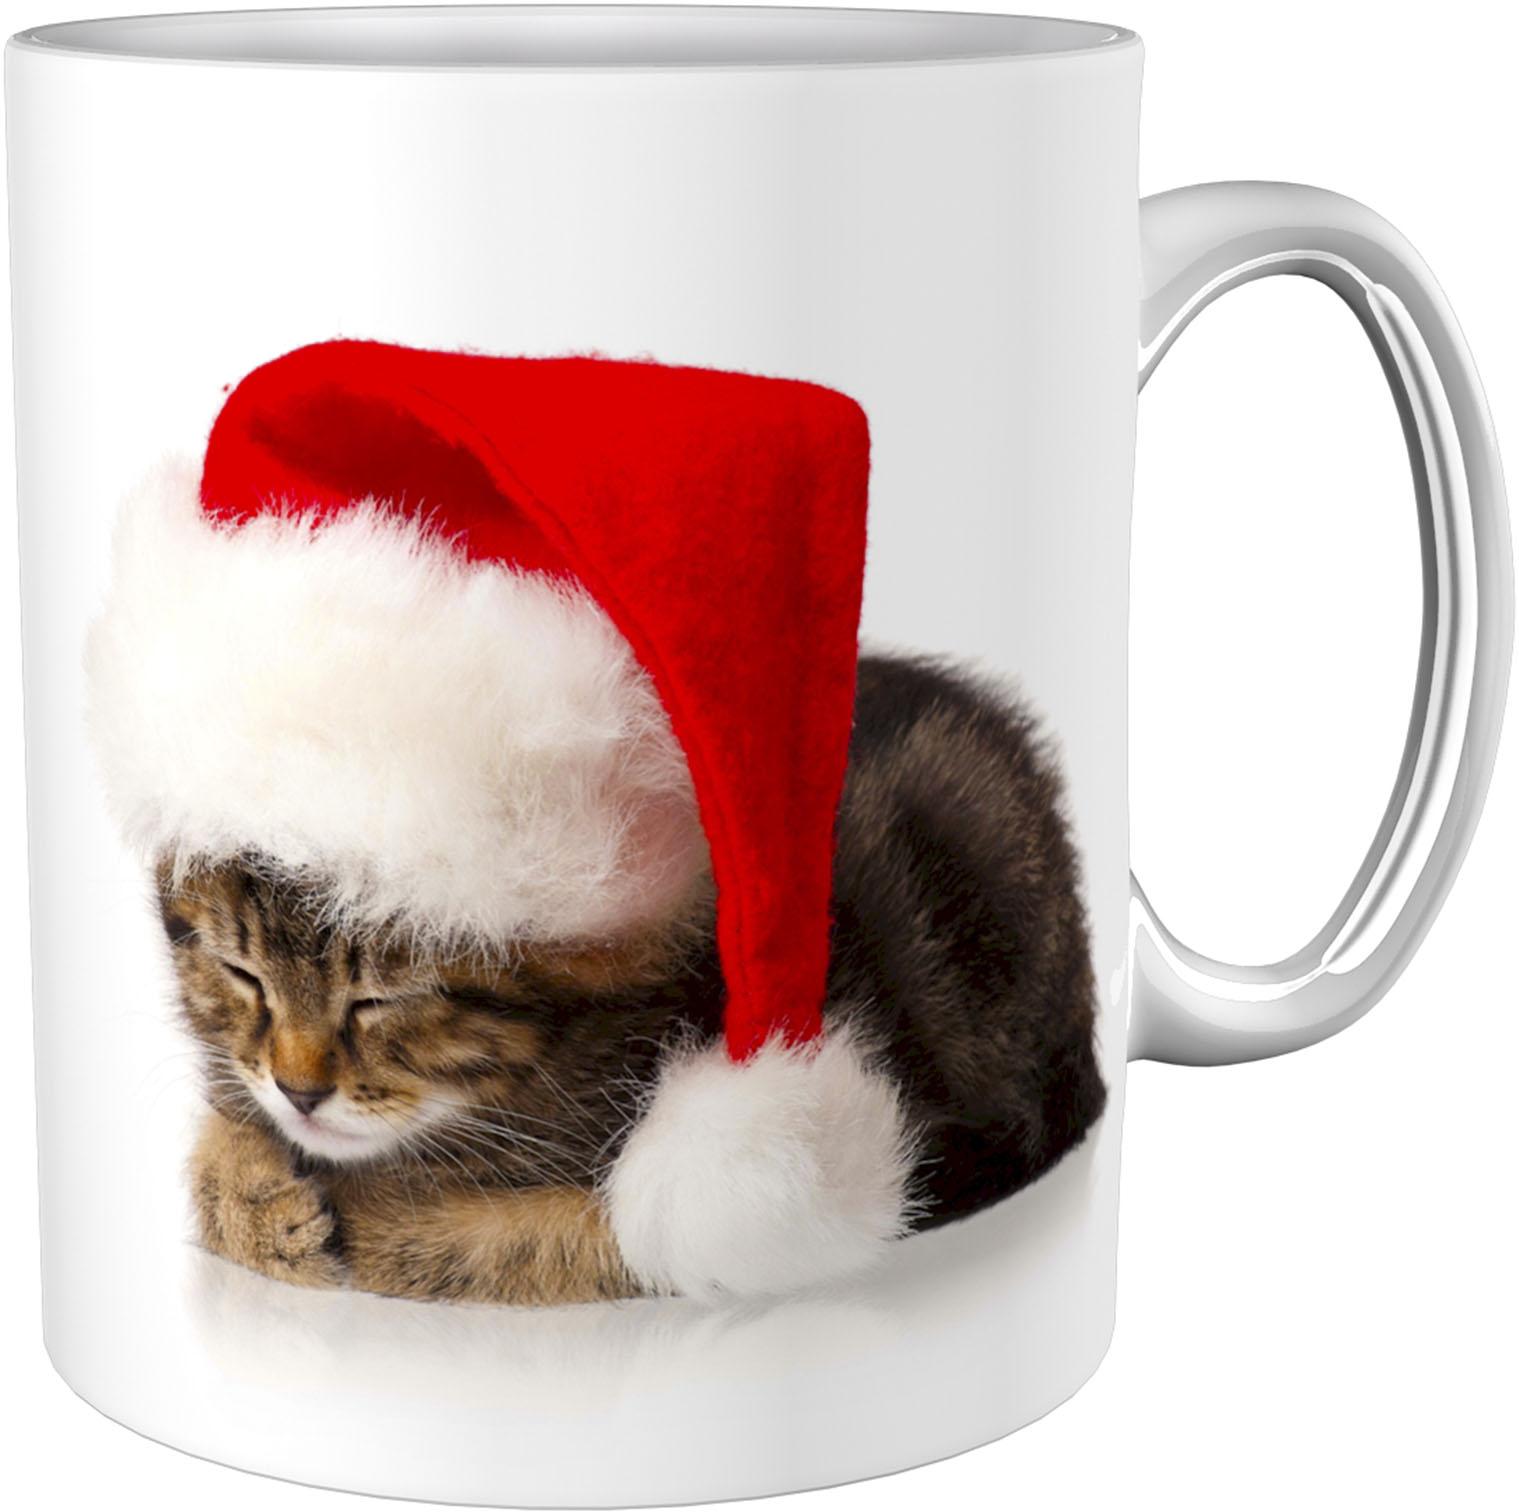 Kaffeetasse / Kaffeebecher / Weihnachten / Geschenktasse